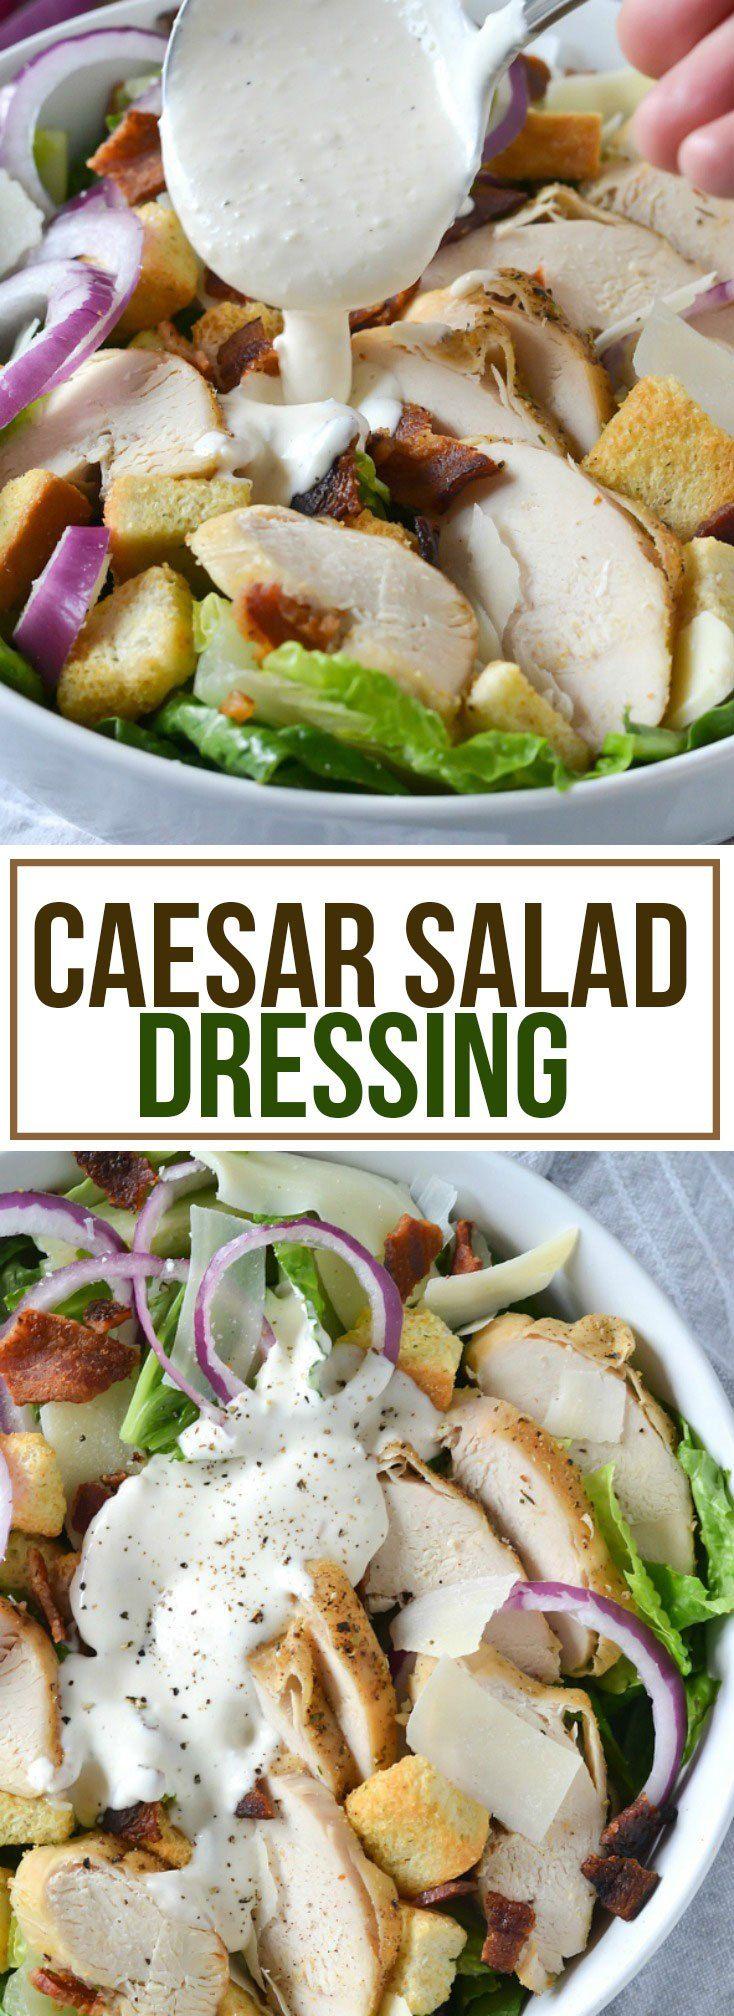 Easy classic ceasar salad dressing recipes